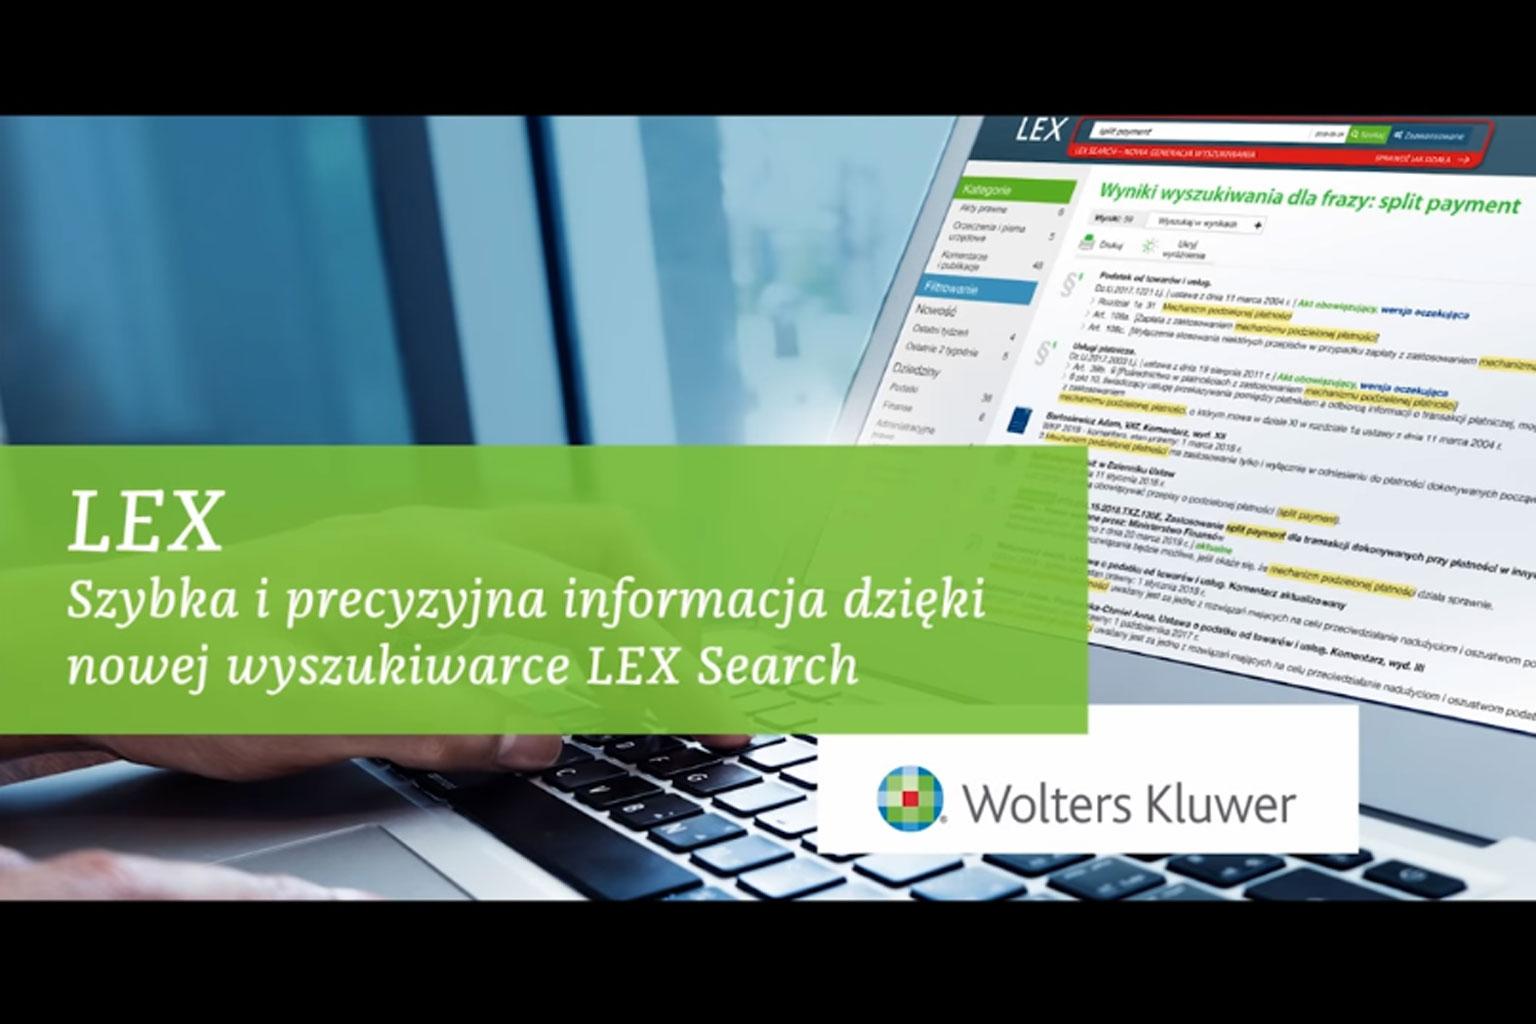 LEX Search